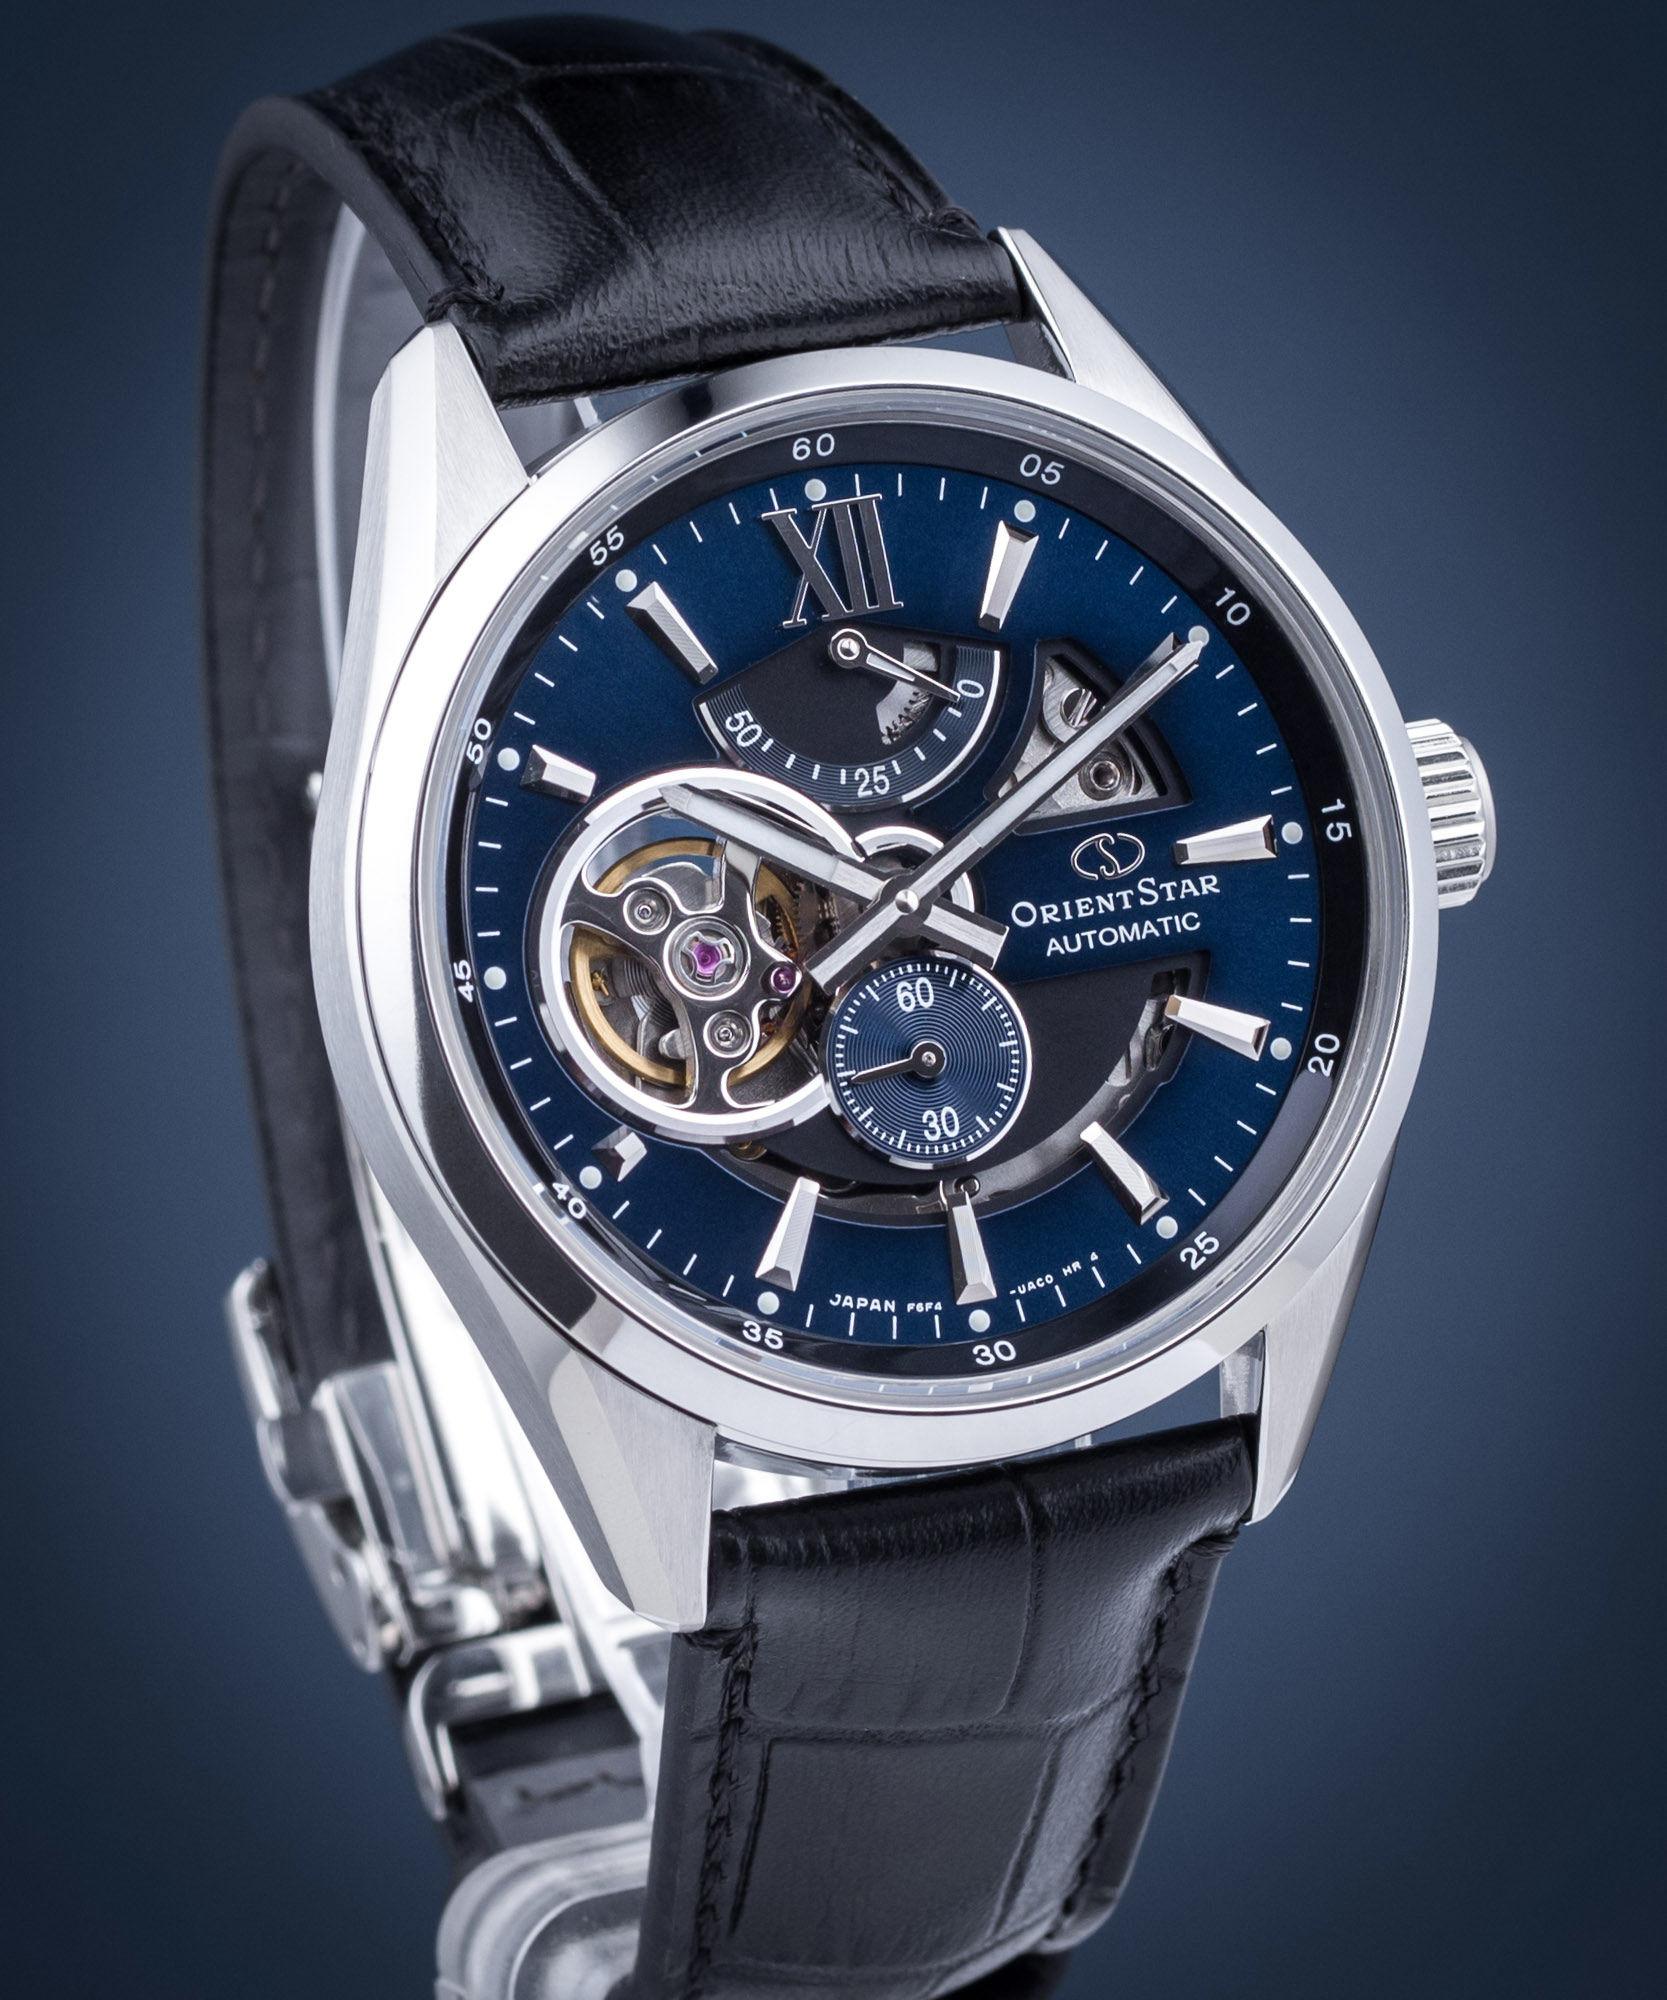 Zegarek męski Orient Star Automatic